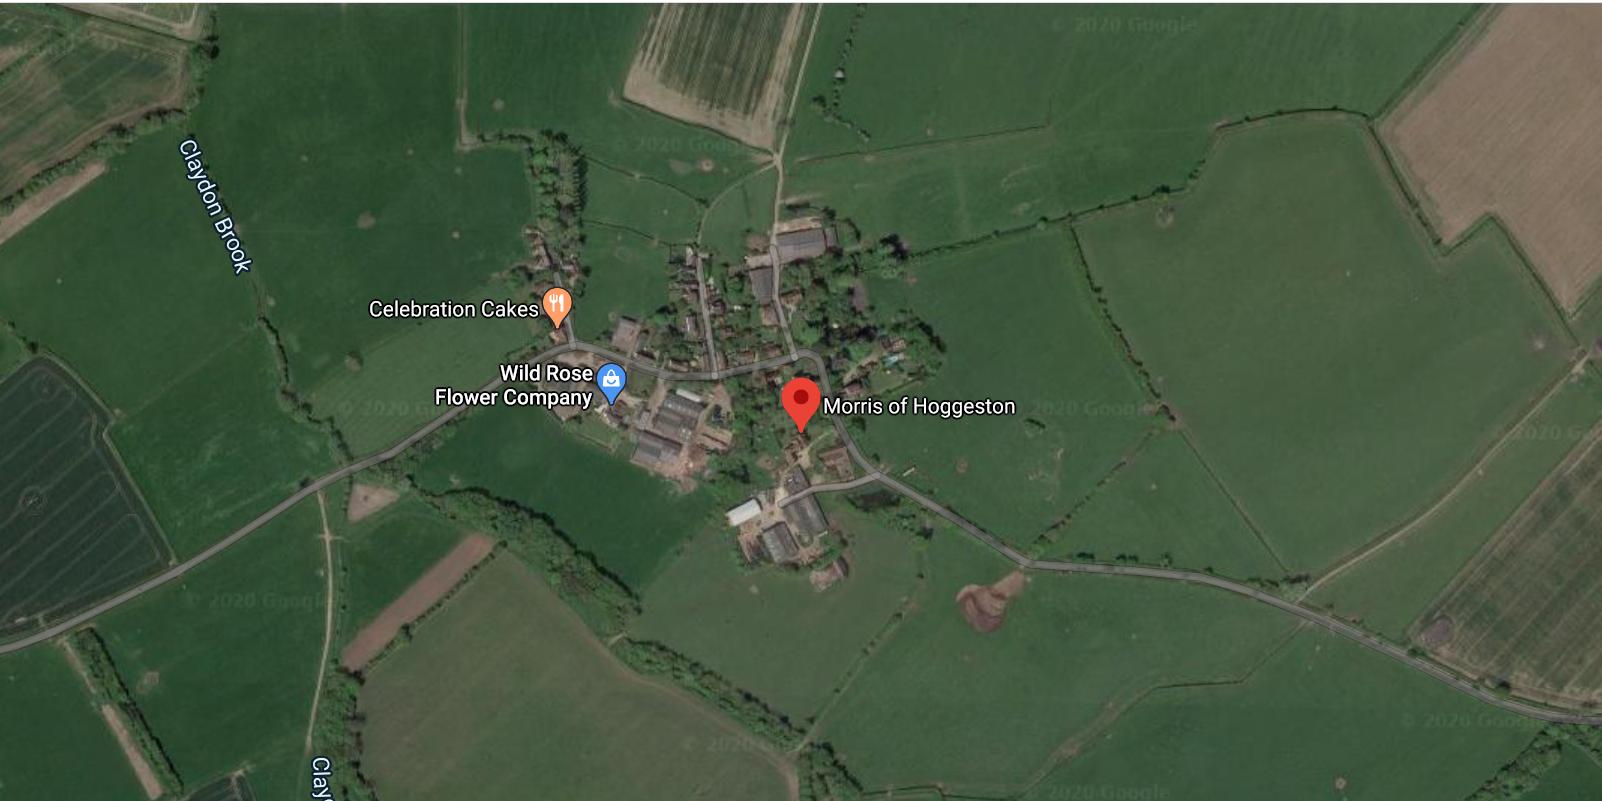 Morris of Hoggeston aerial image